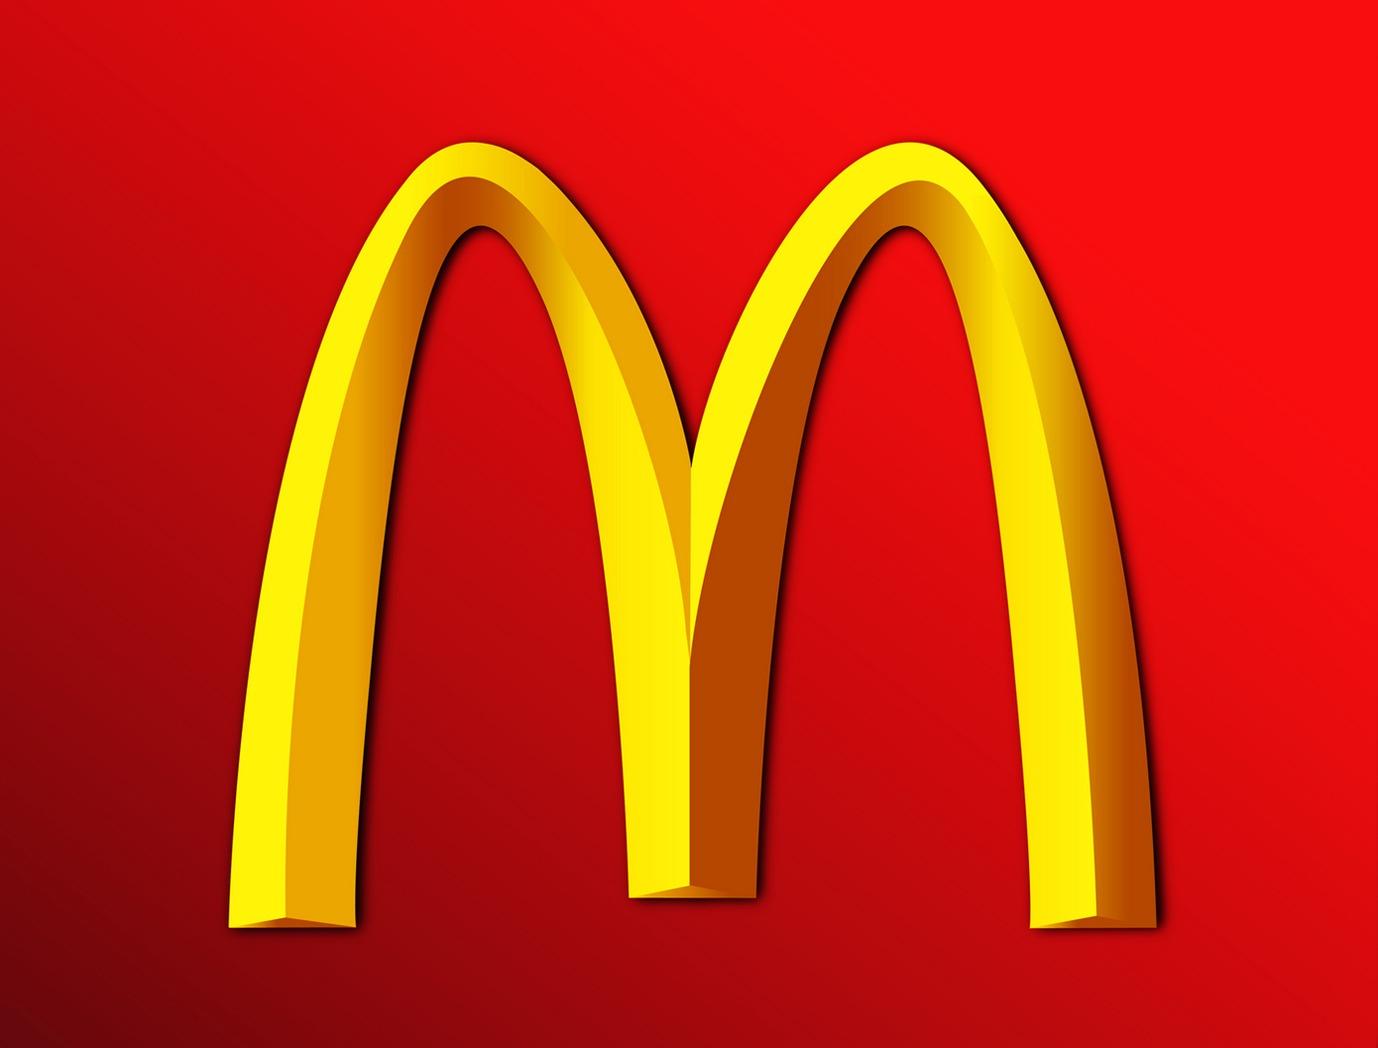 mcdonalds vegan options